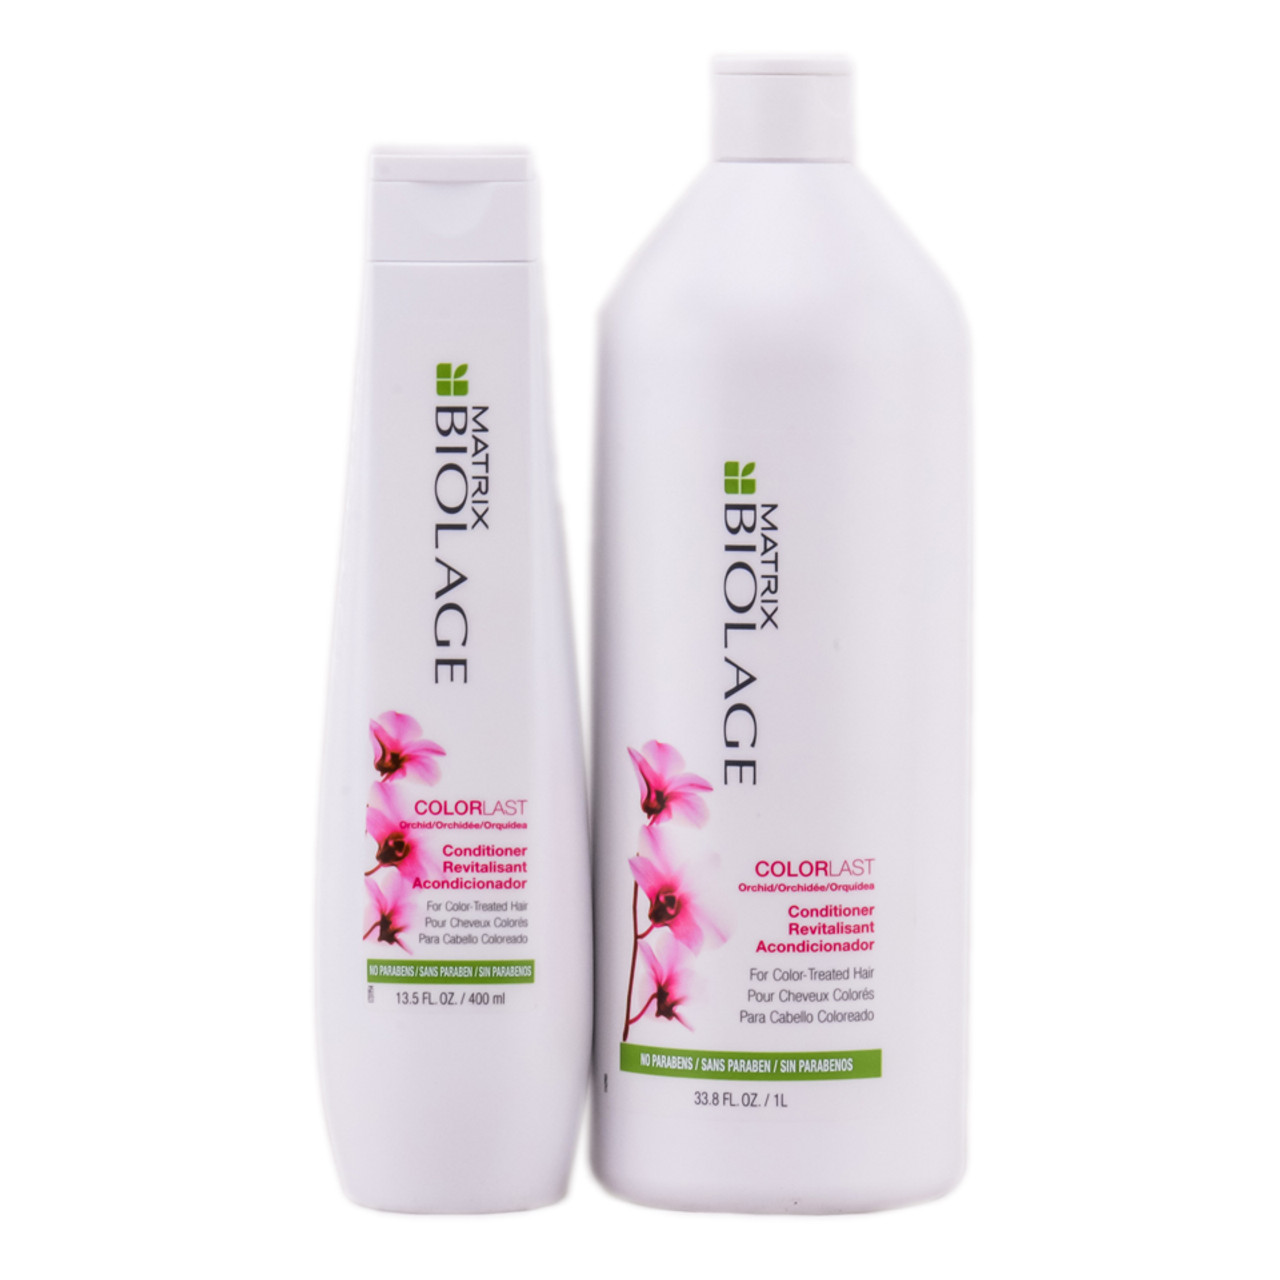 Matrix hair brush 4 - Matrix Biolage Colorlast Conditioner For Color Treated Hair